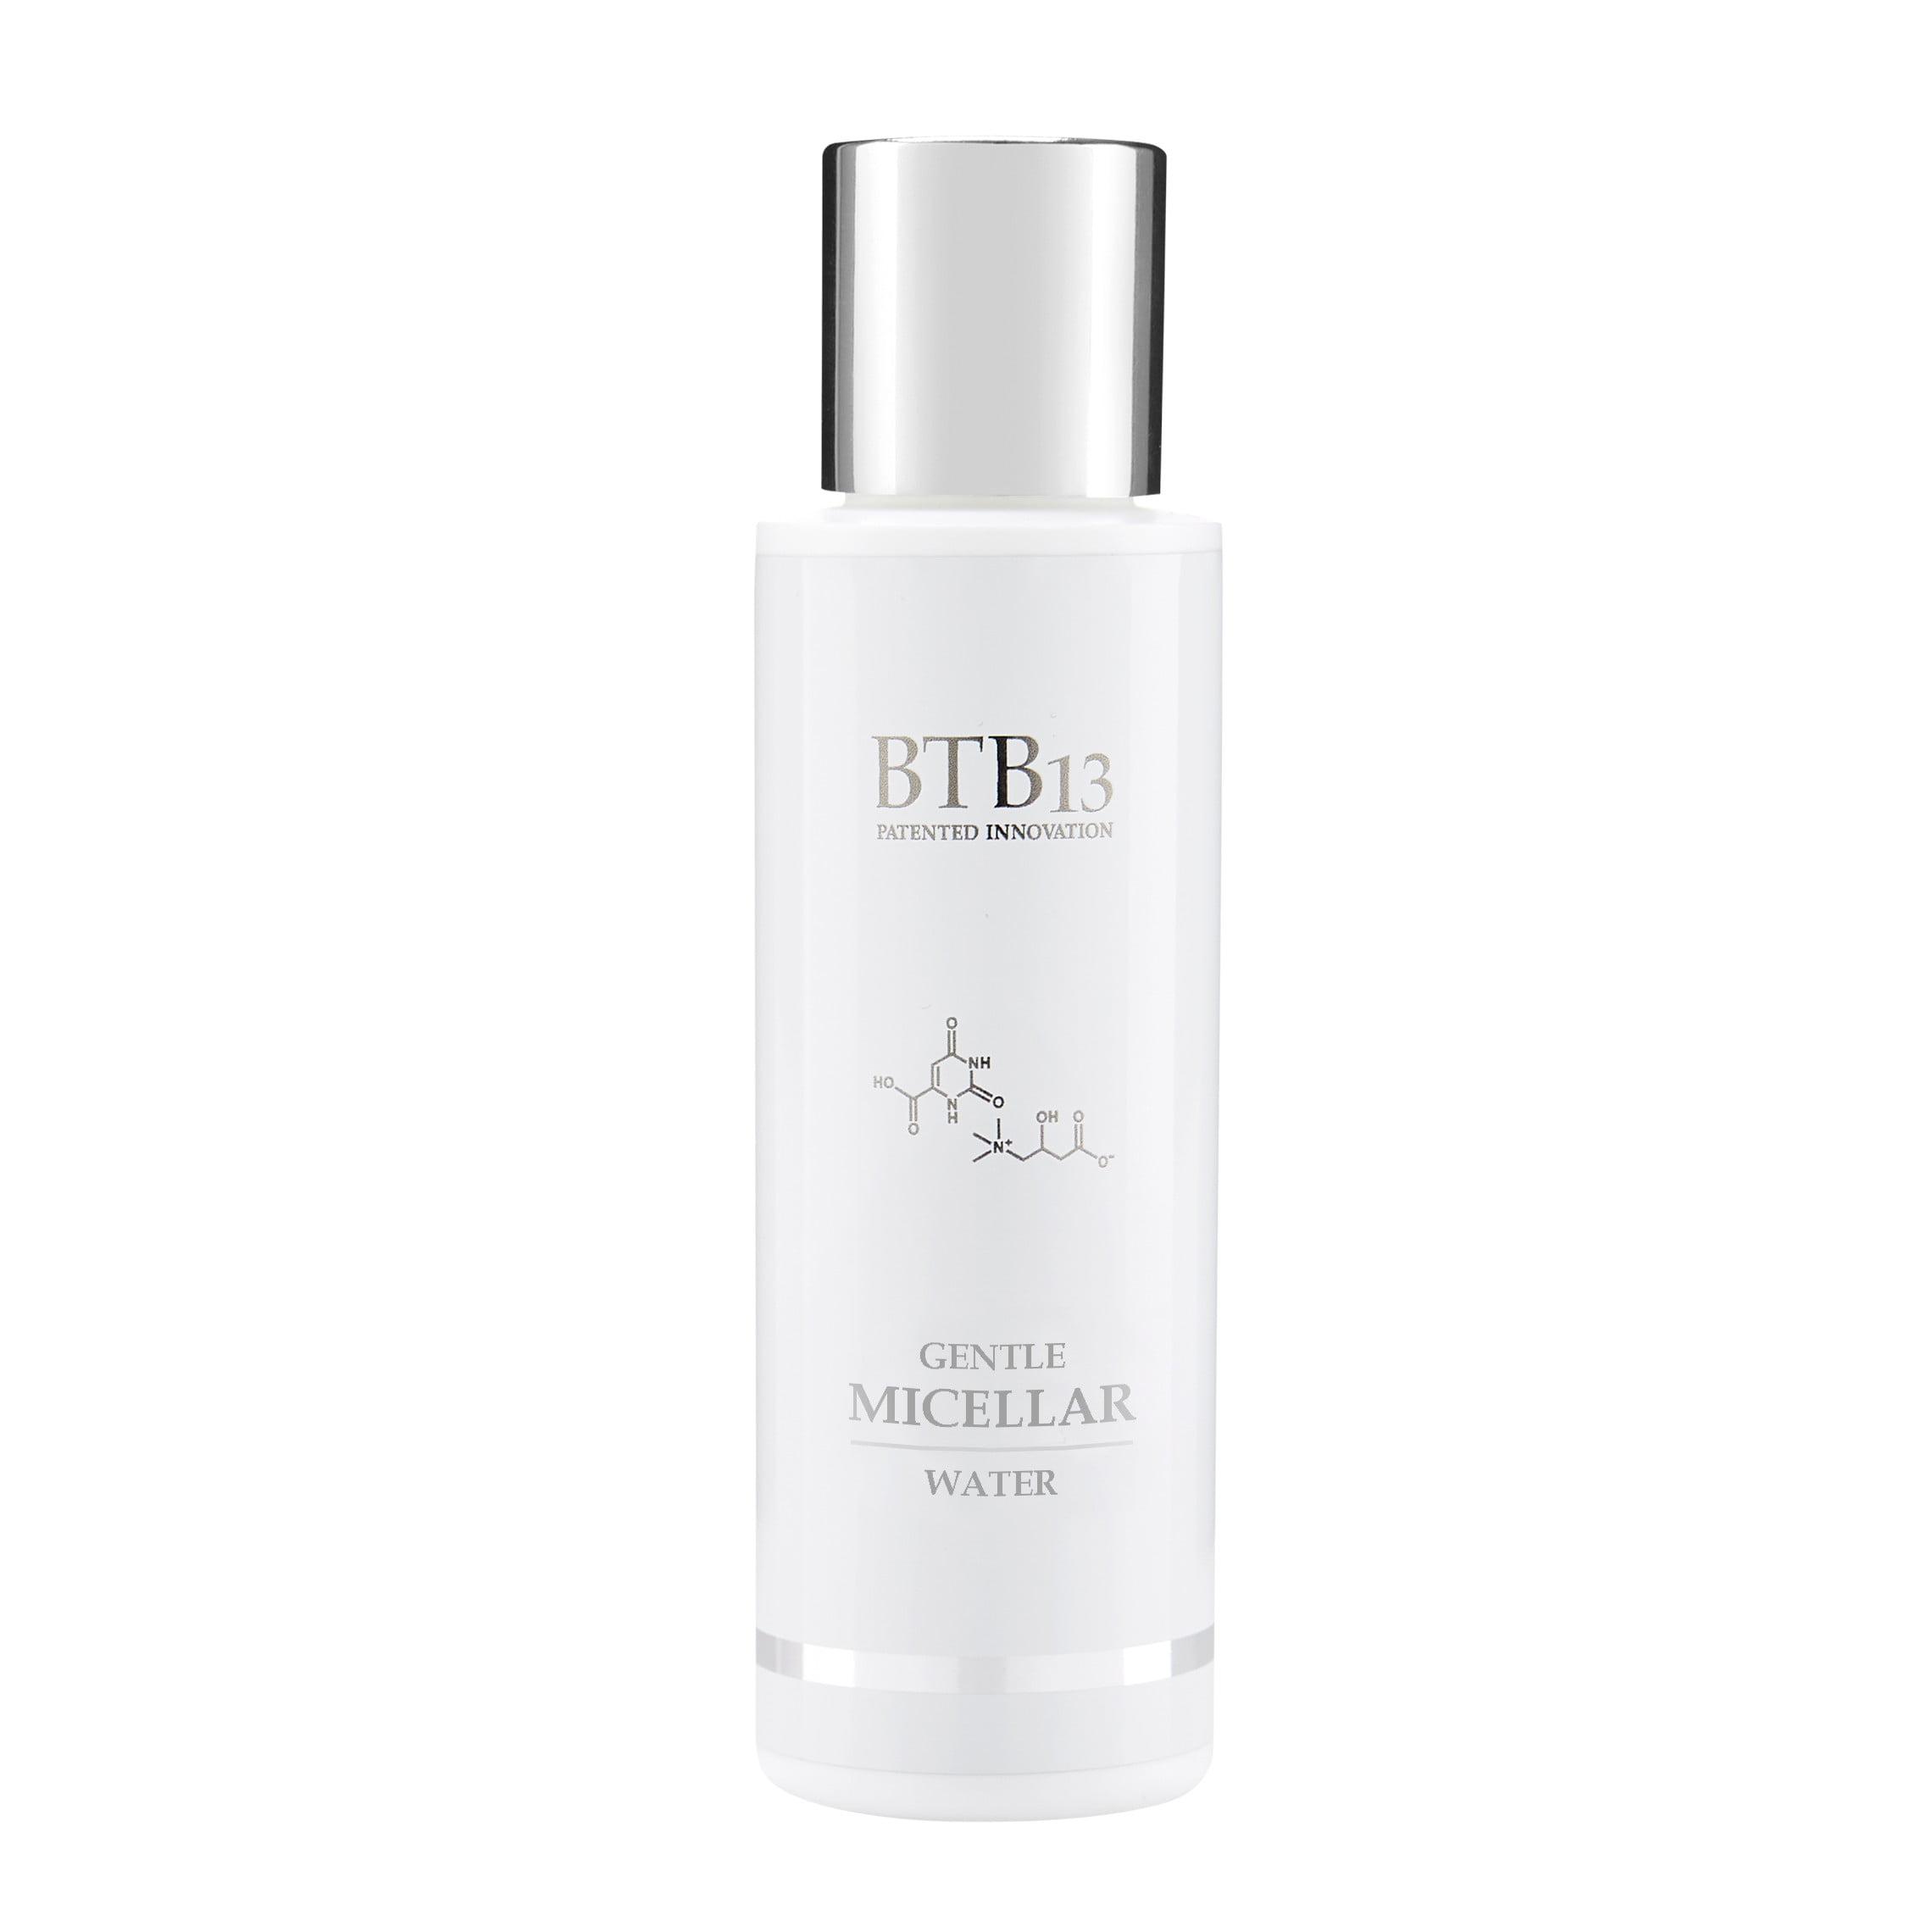 Tuotekuva BTB13 Gentle micellar water